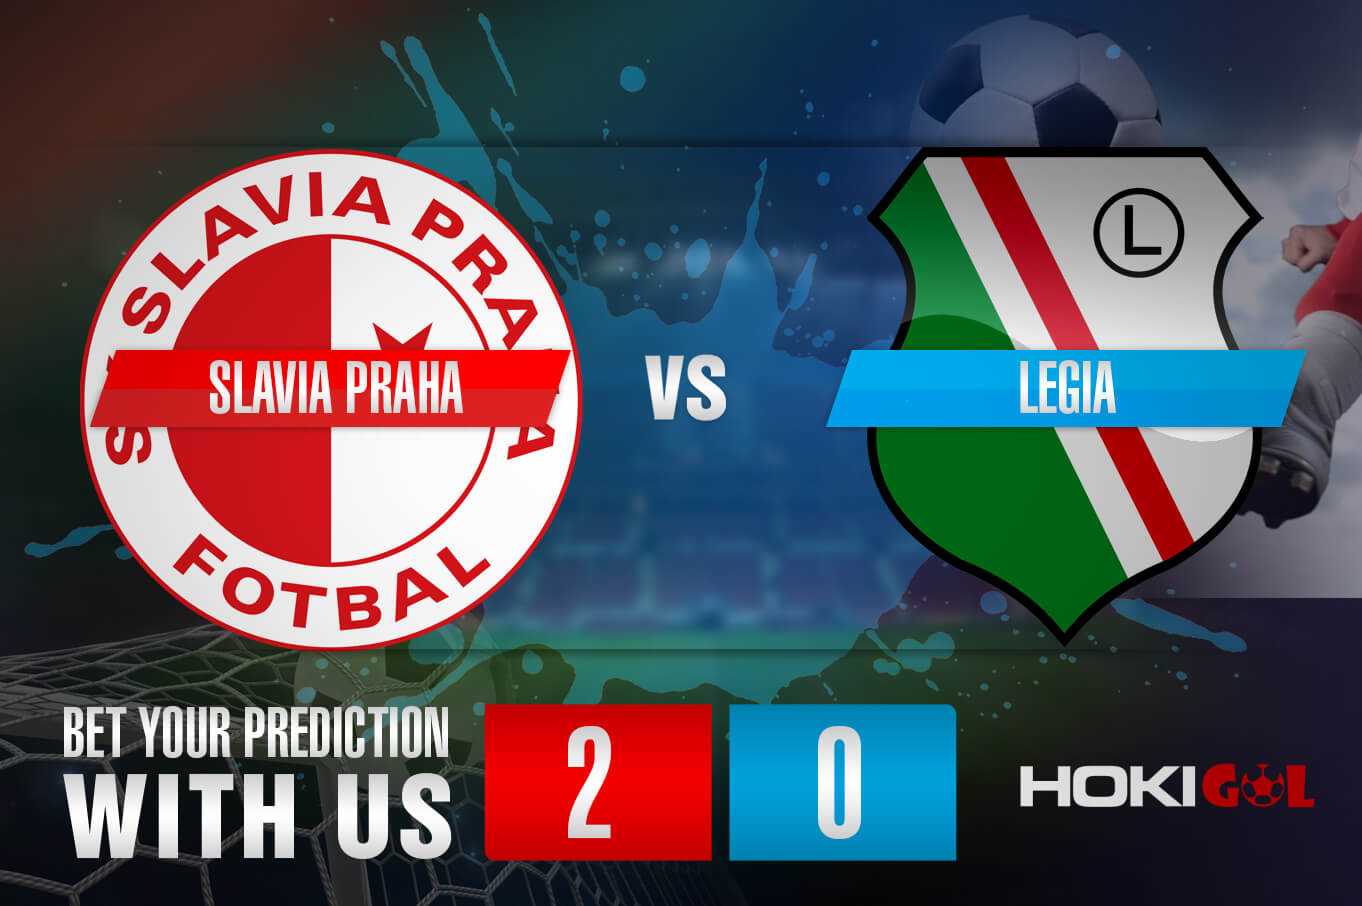 Prediksi Bola Slavia Praha Vs Legia 20 Agustus 2021